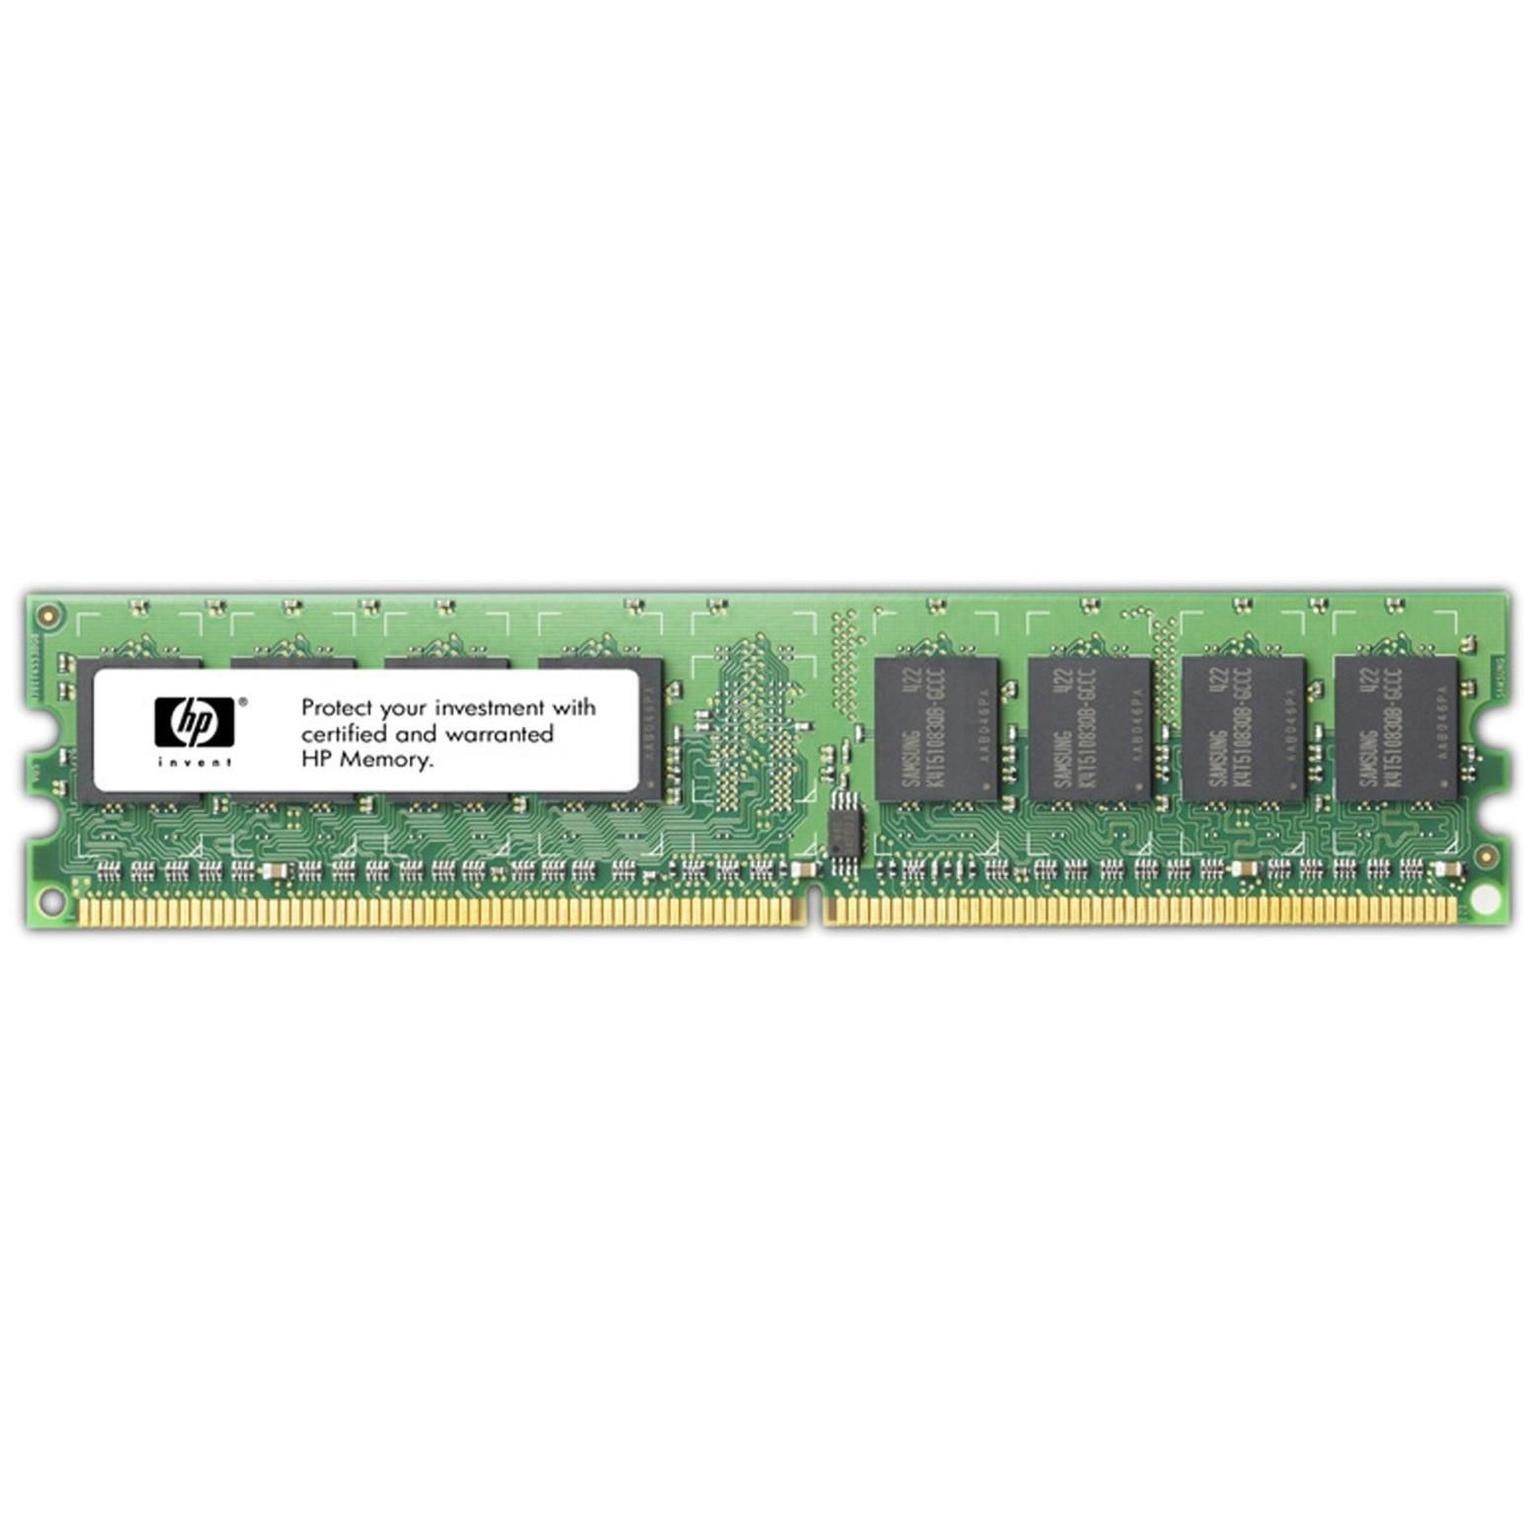 HP 4GB DDR3-1333 Single-Rank Registered x4 CL9